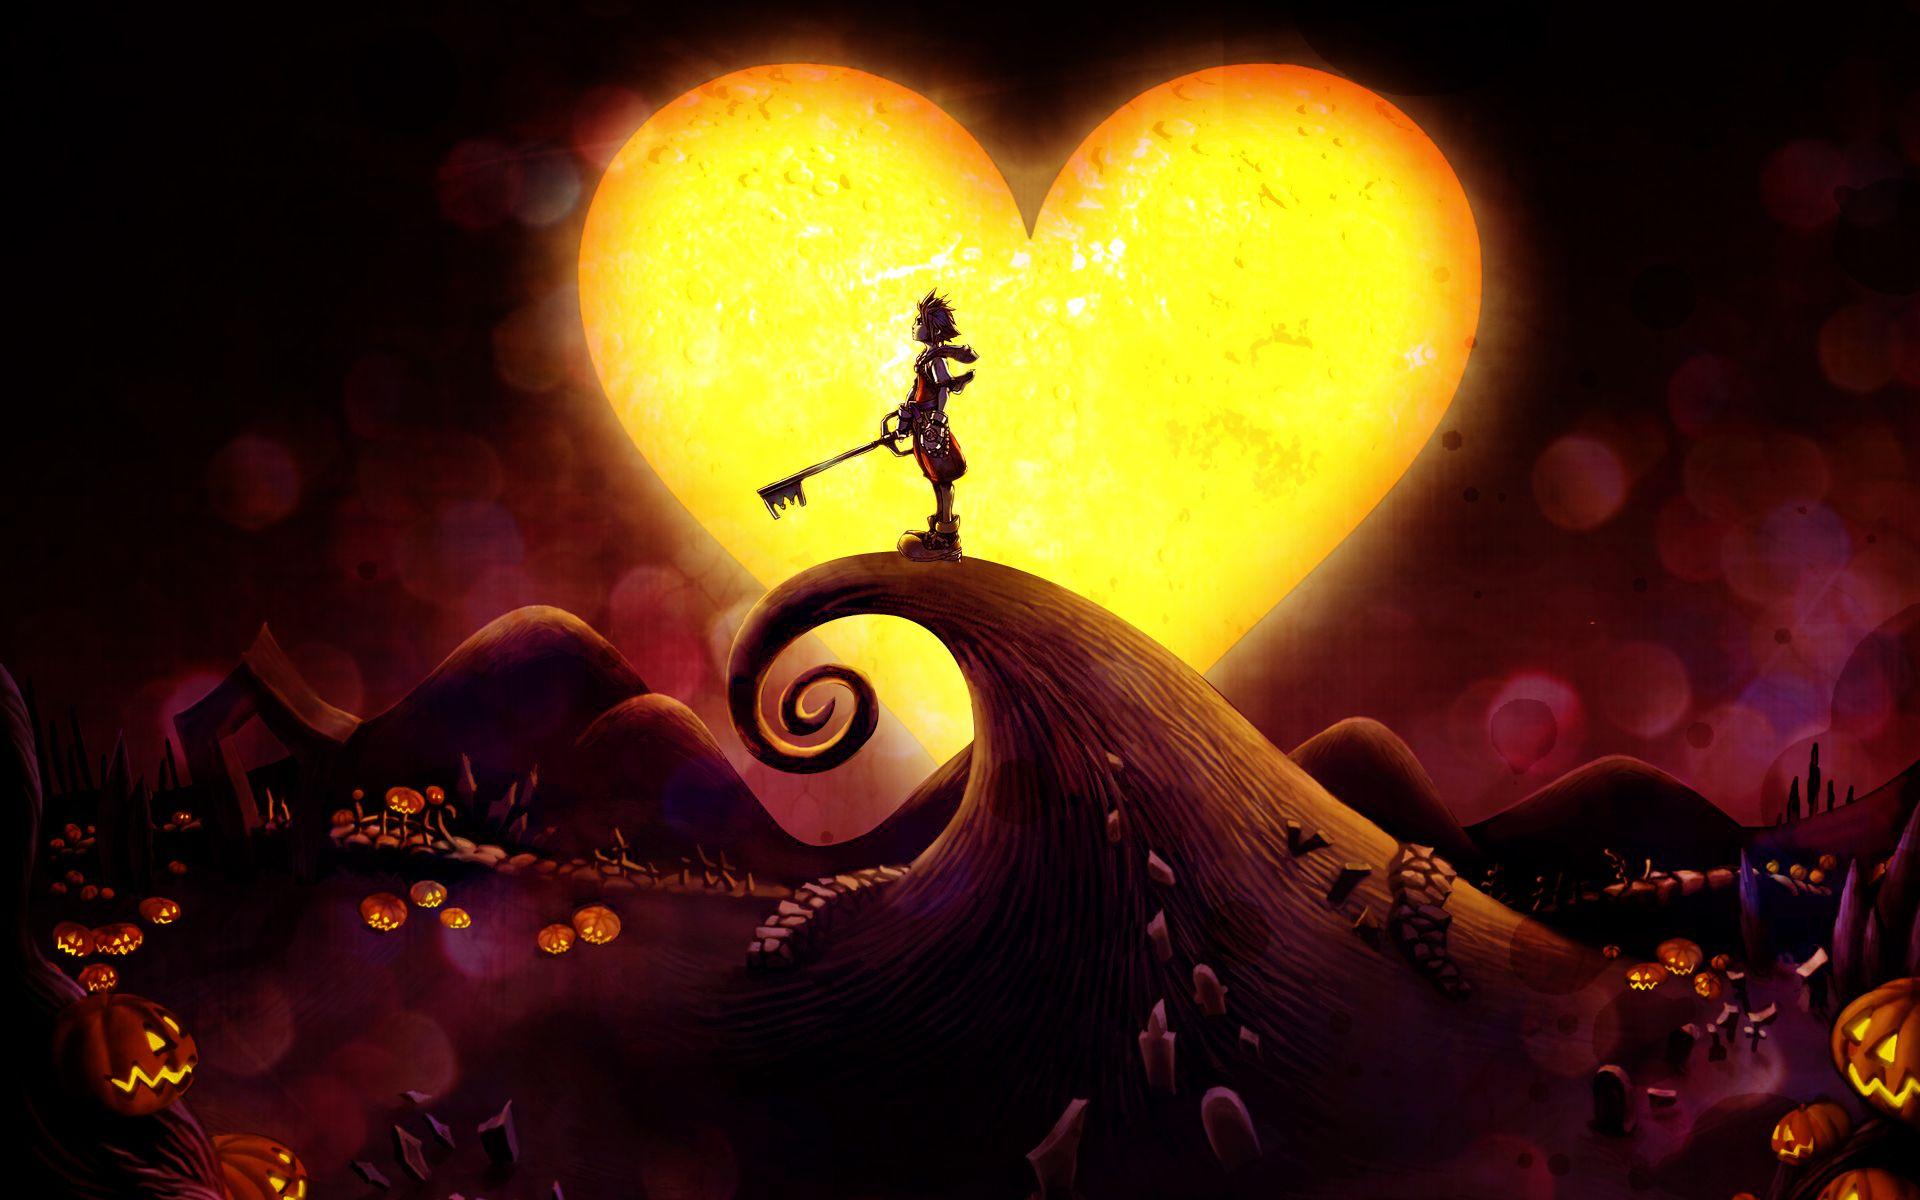 Pin by Kibachan on Just Art | Pinterest | Sora kingdom hearts ...